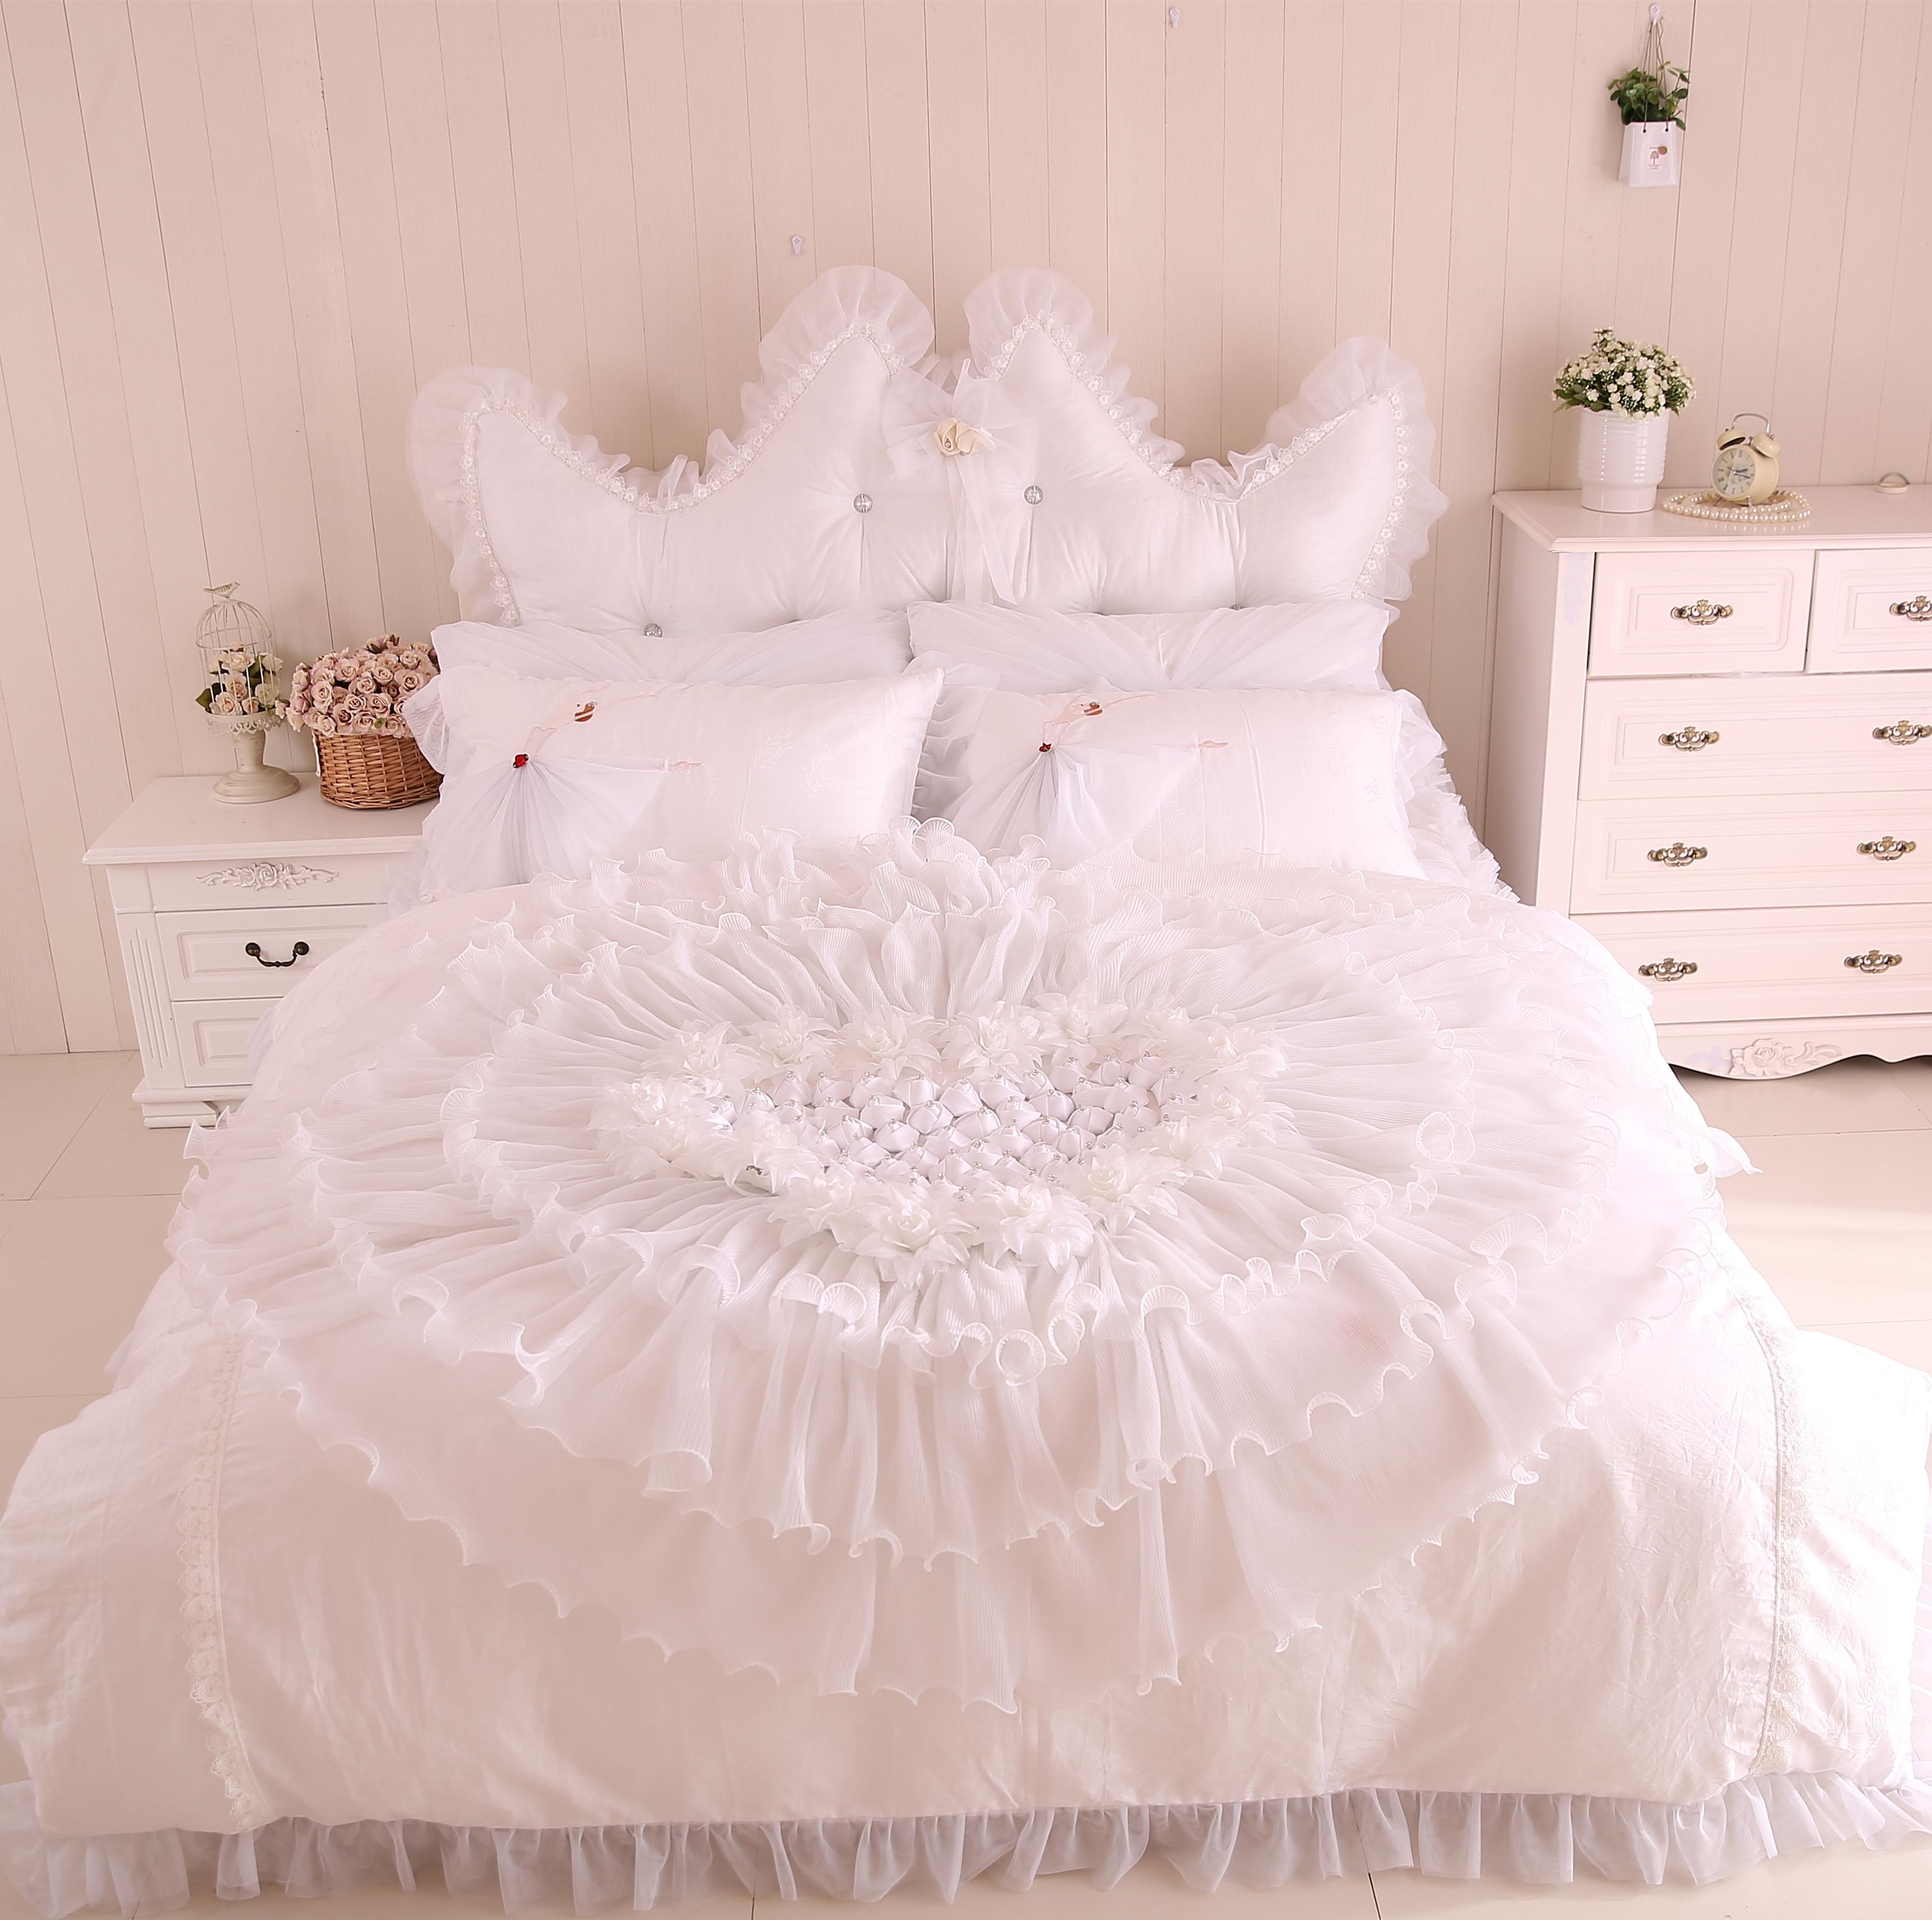 Wedding bed sheet set - Designer Luxury Wedding Bed Sheet